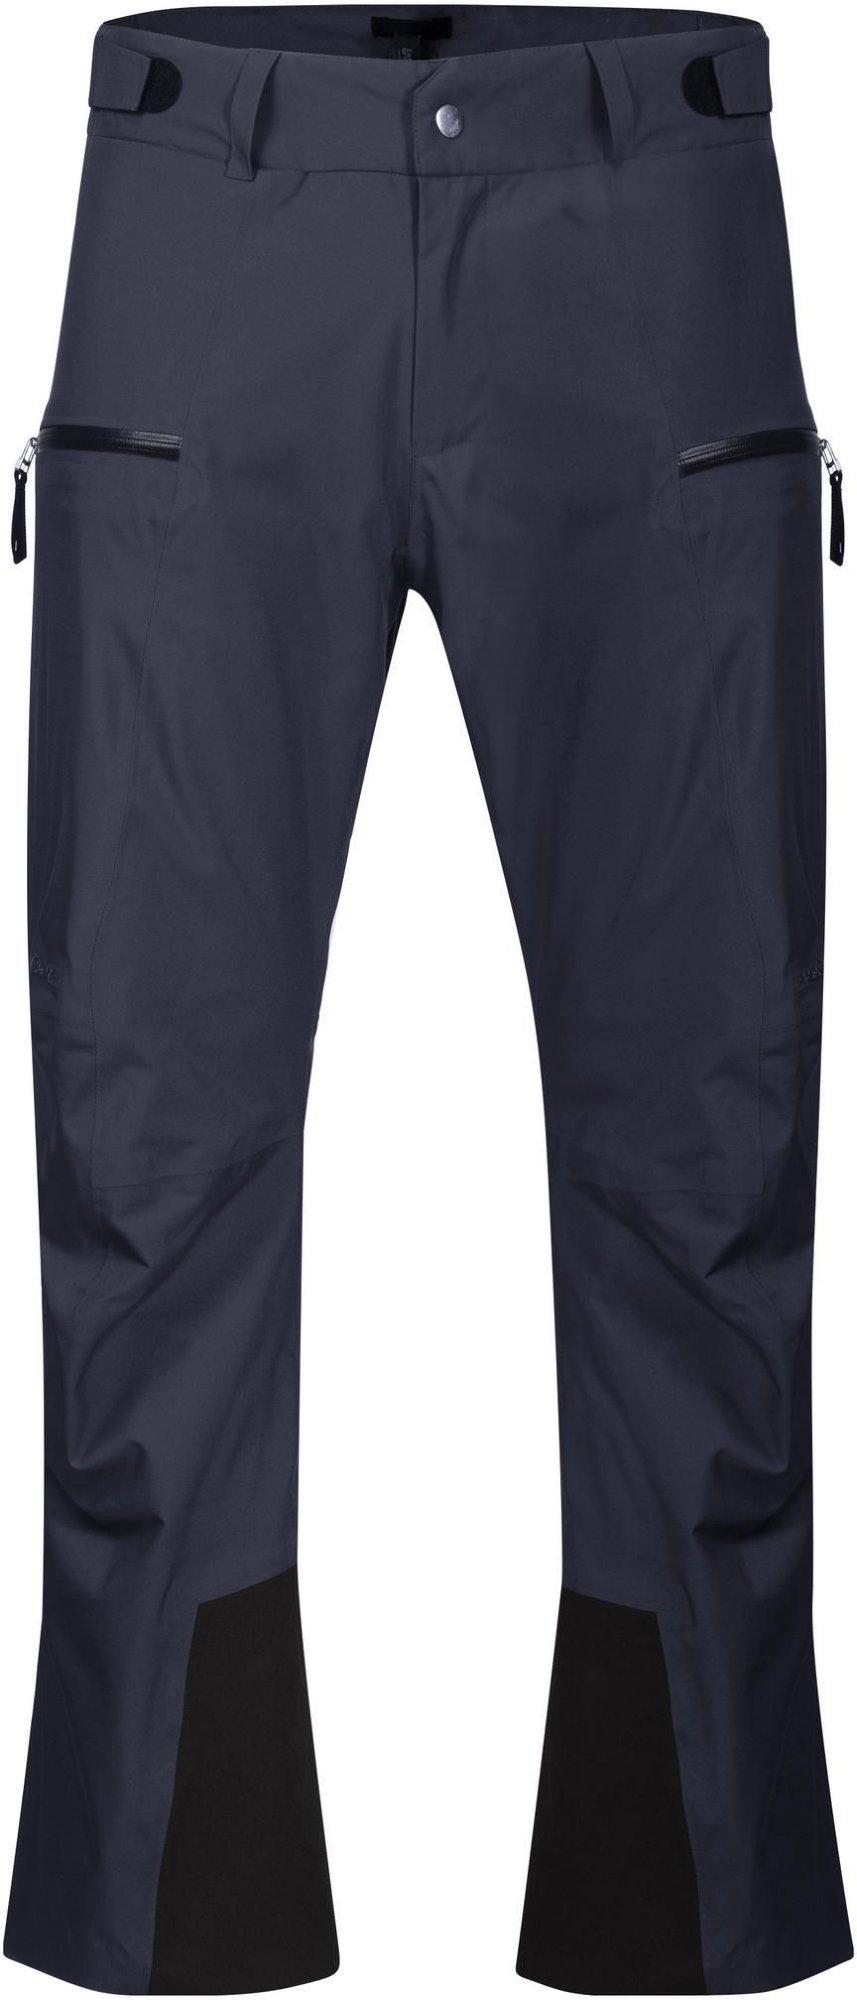 Bergans Stranda Insulated Pants (Herre)